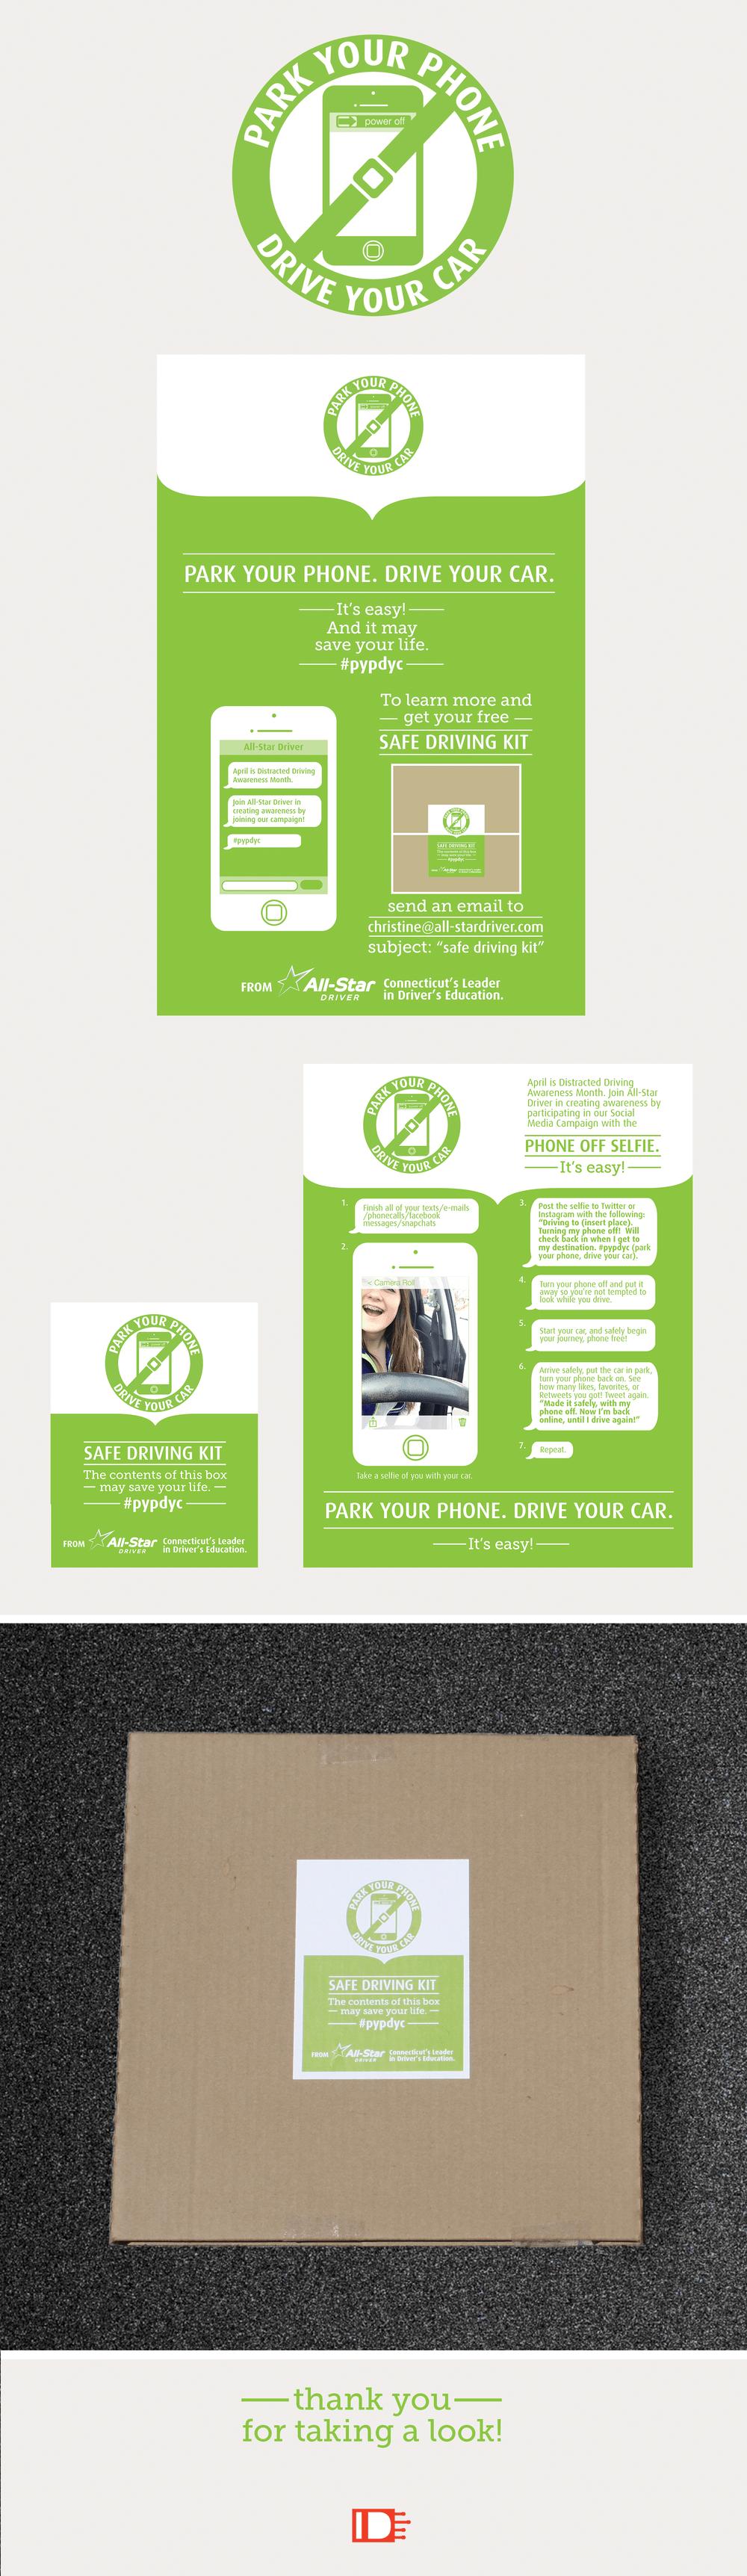 pypdyc campaign.png